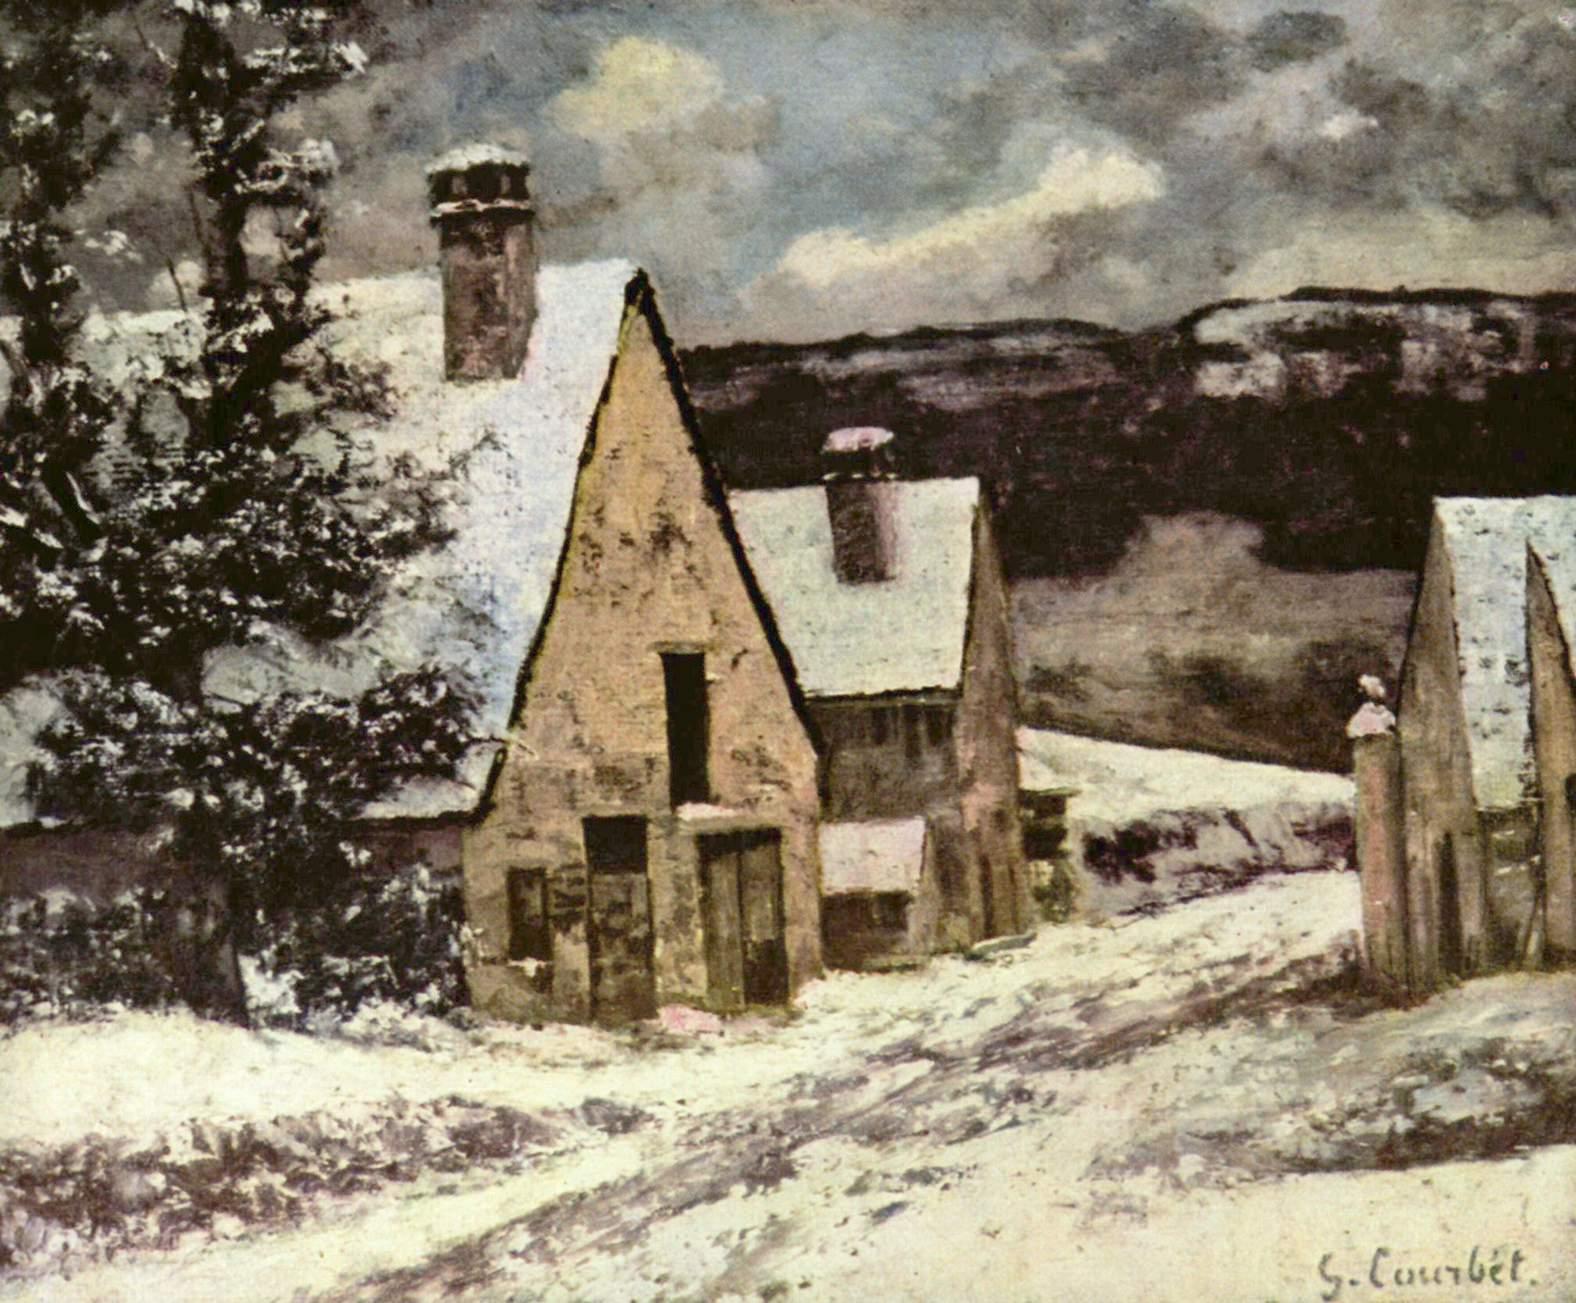 Gustave_Courbet_021.jpg